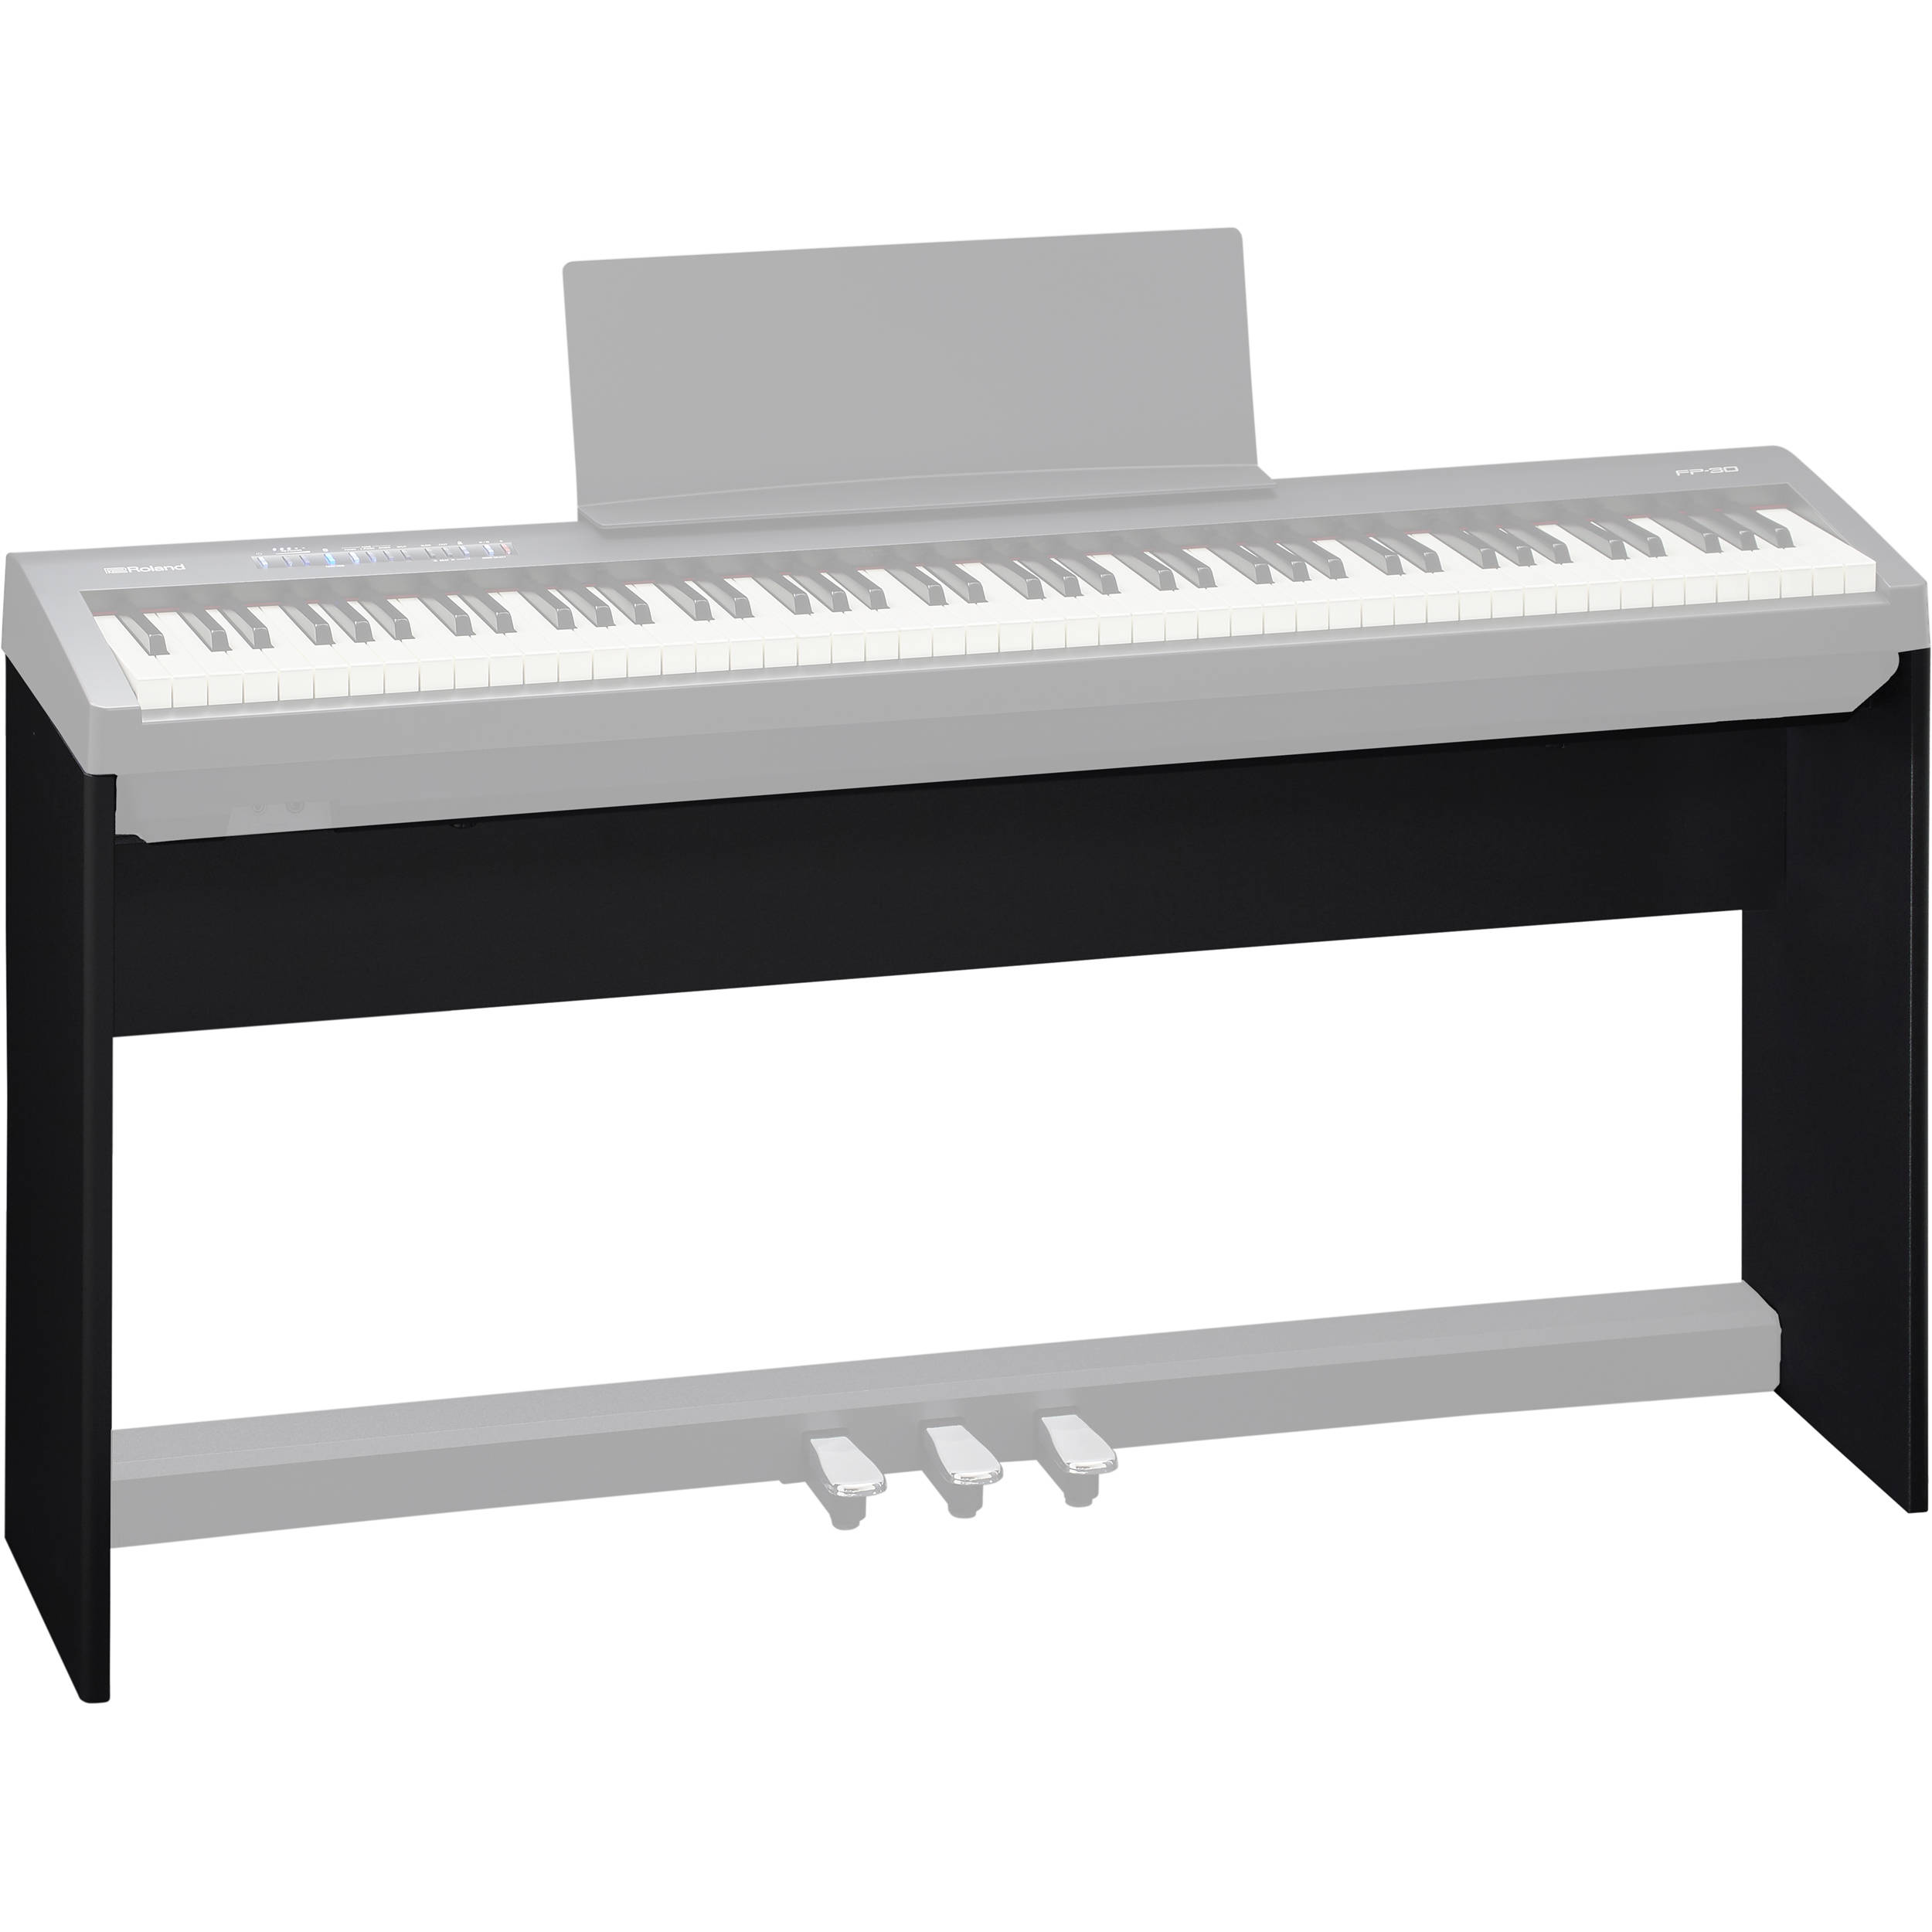 Roland Fp 30 Digital Piano Ebay : roland ksc 70 bk digital piano stand for fp 30 4957054507886 ebay ~ Vivirlamusica.com Haus und Dekorationen